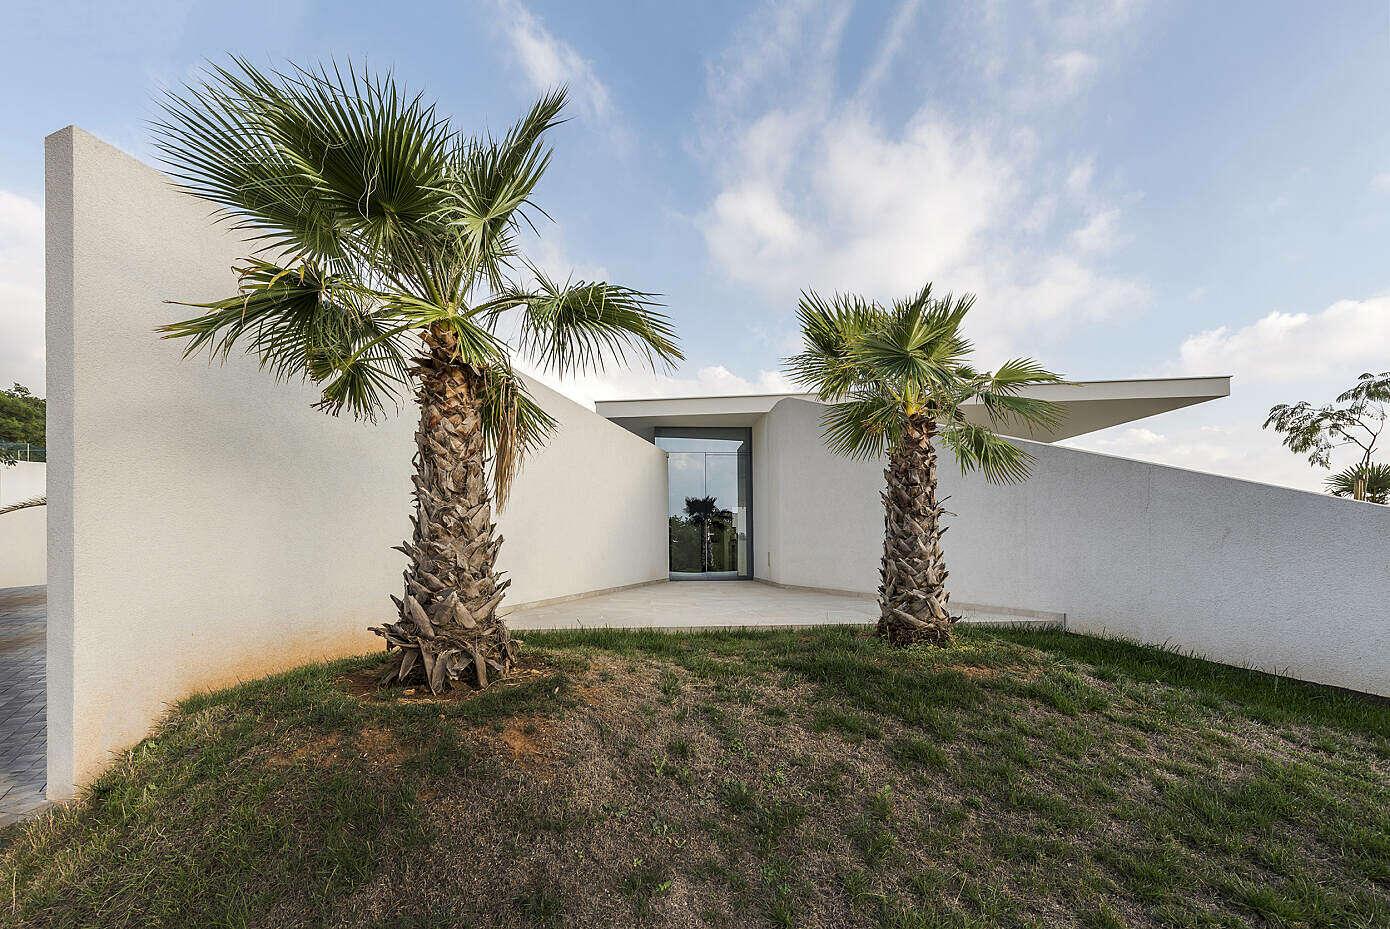 Bedrock House by Idis Turato